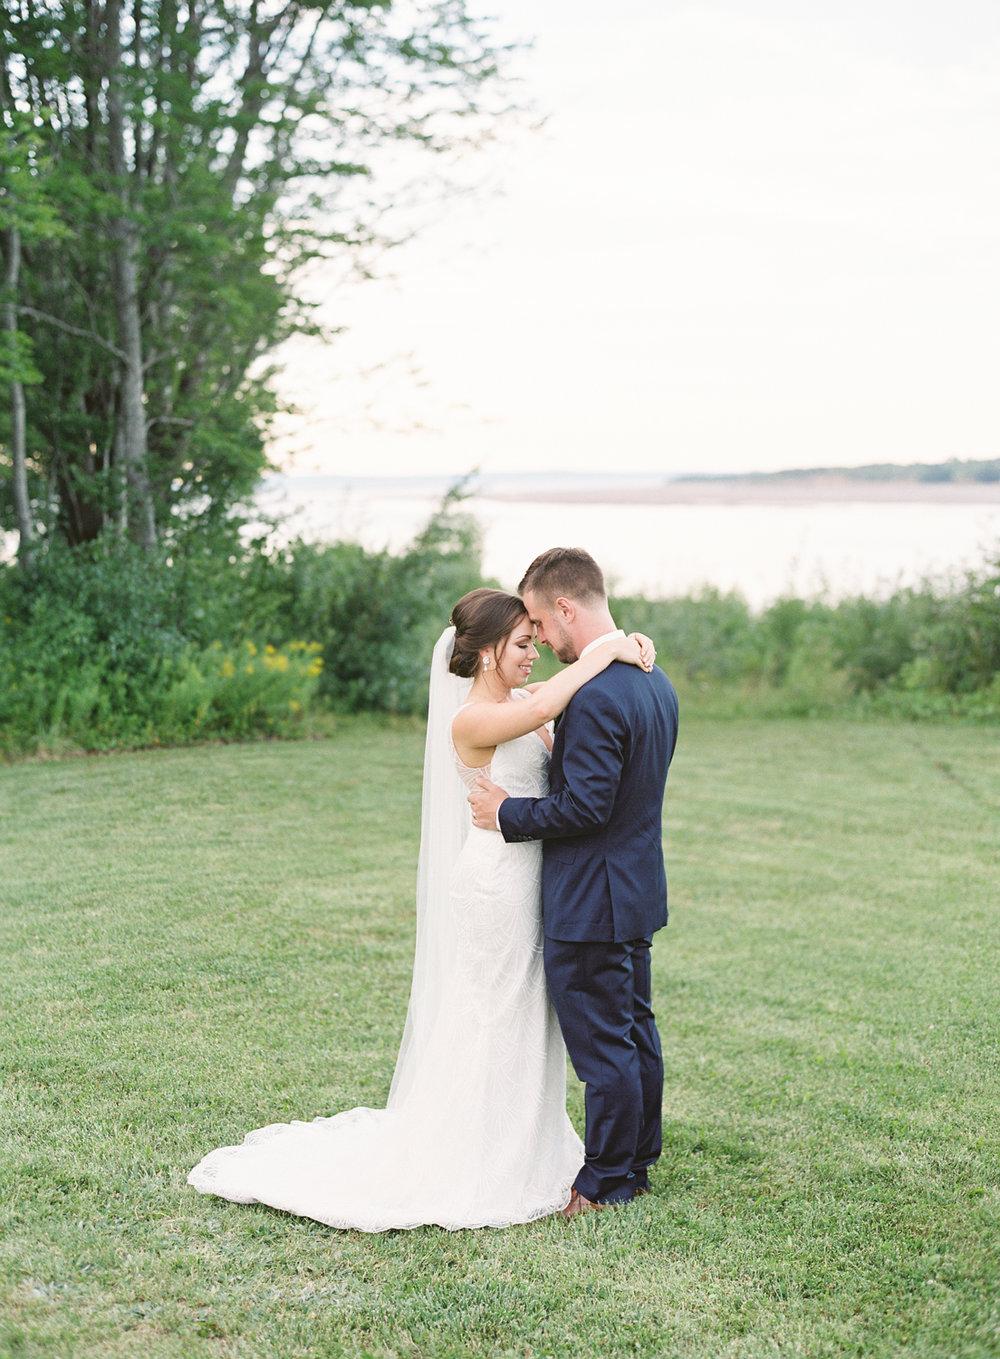 Jacqueline Anne Photography - Nova Scotia Backyard Wedding-84.jpg